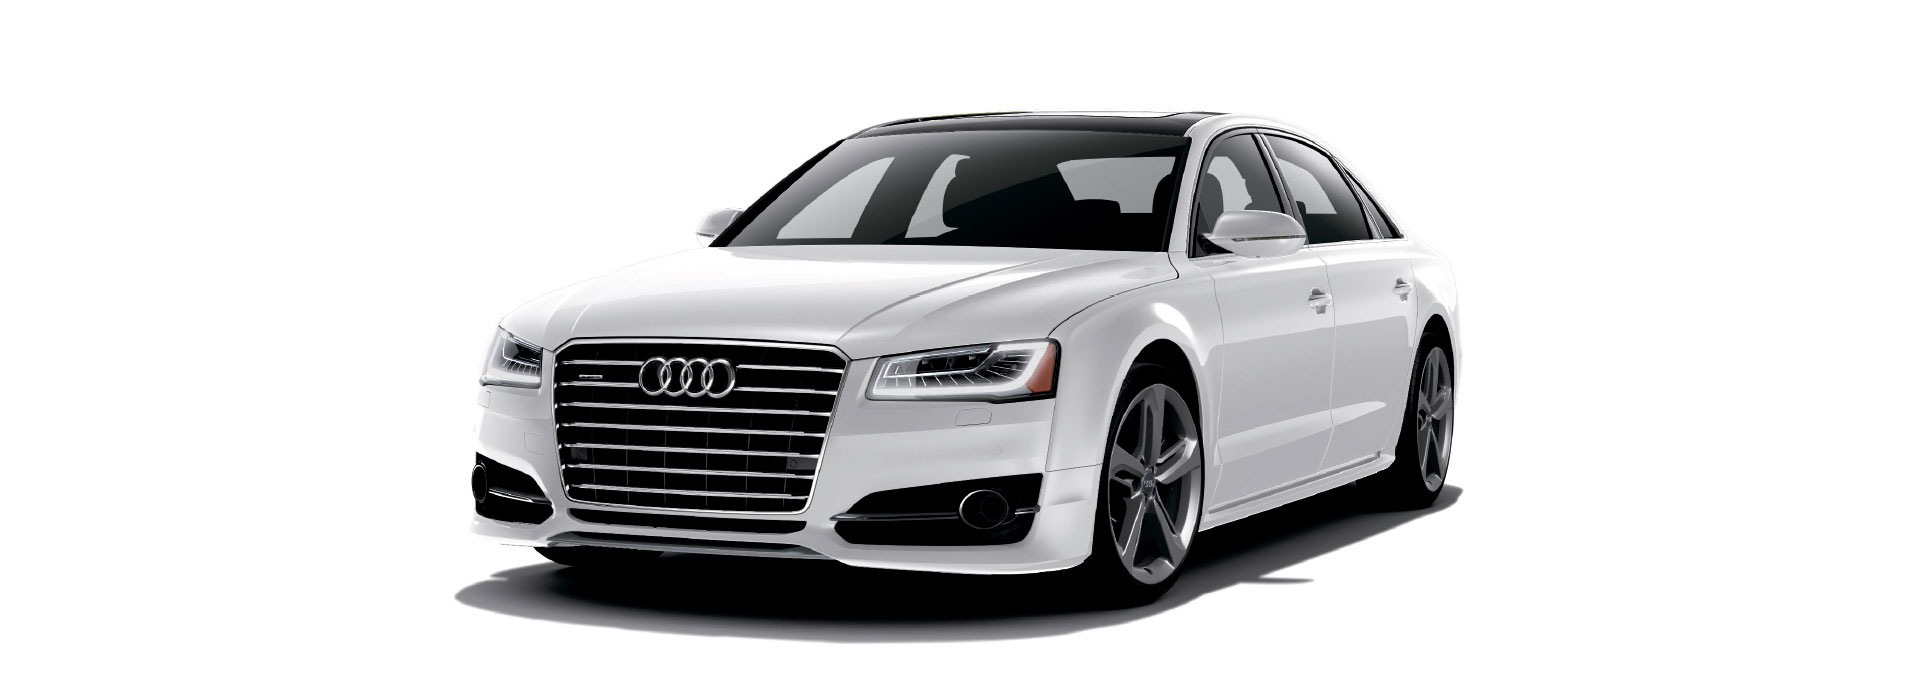 Audi A8L 4.0 TFSI